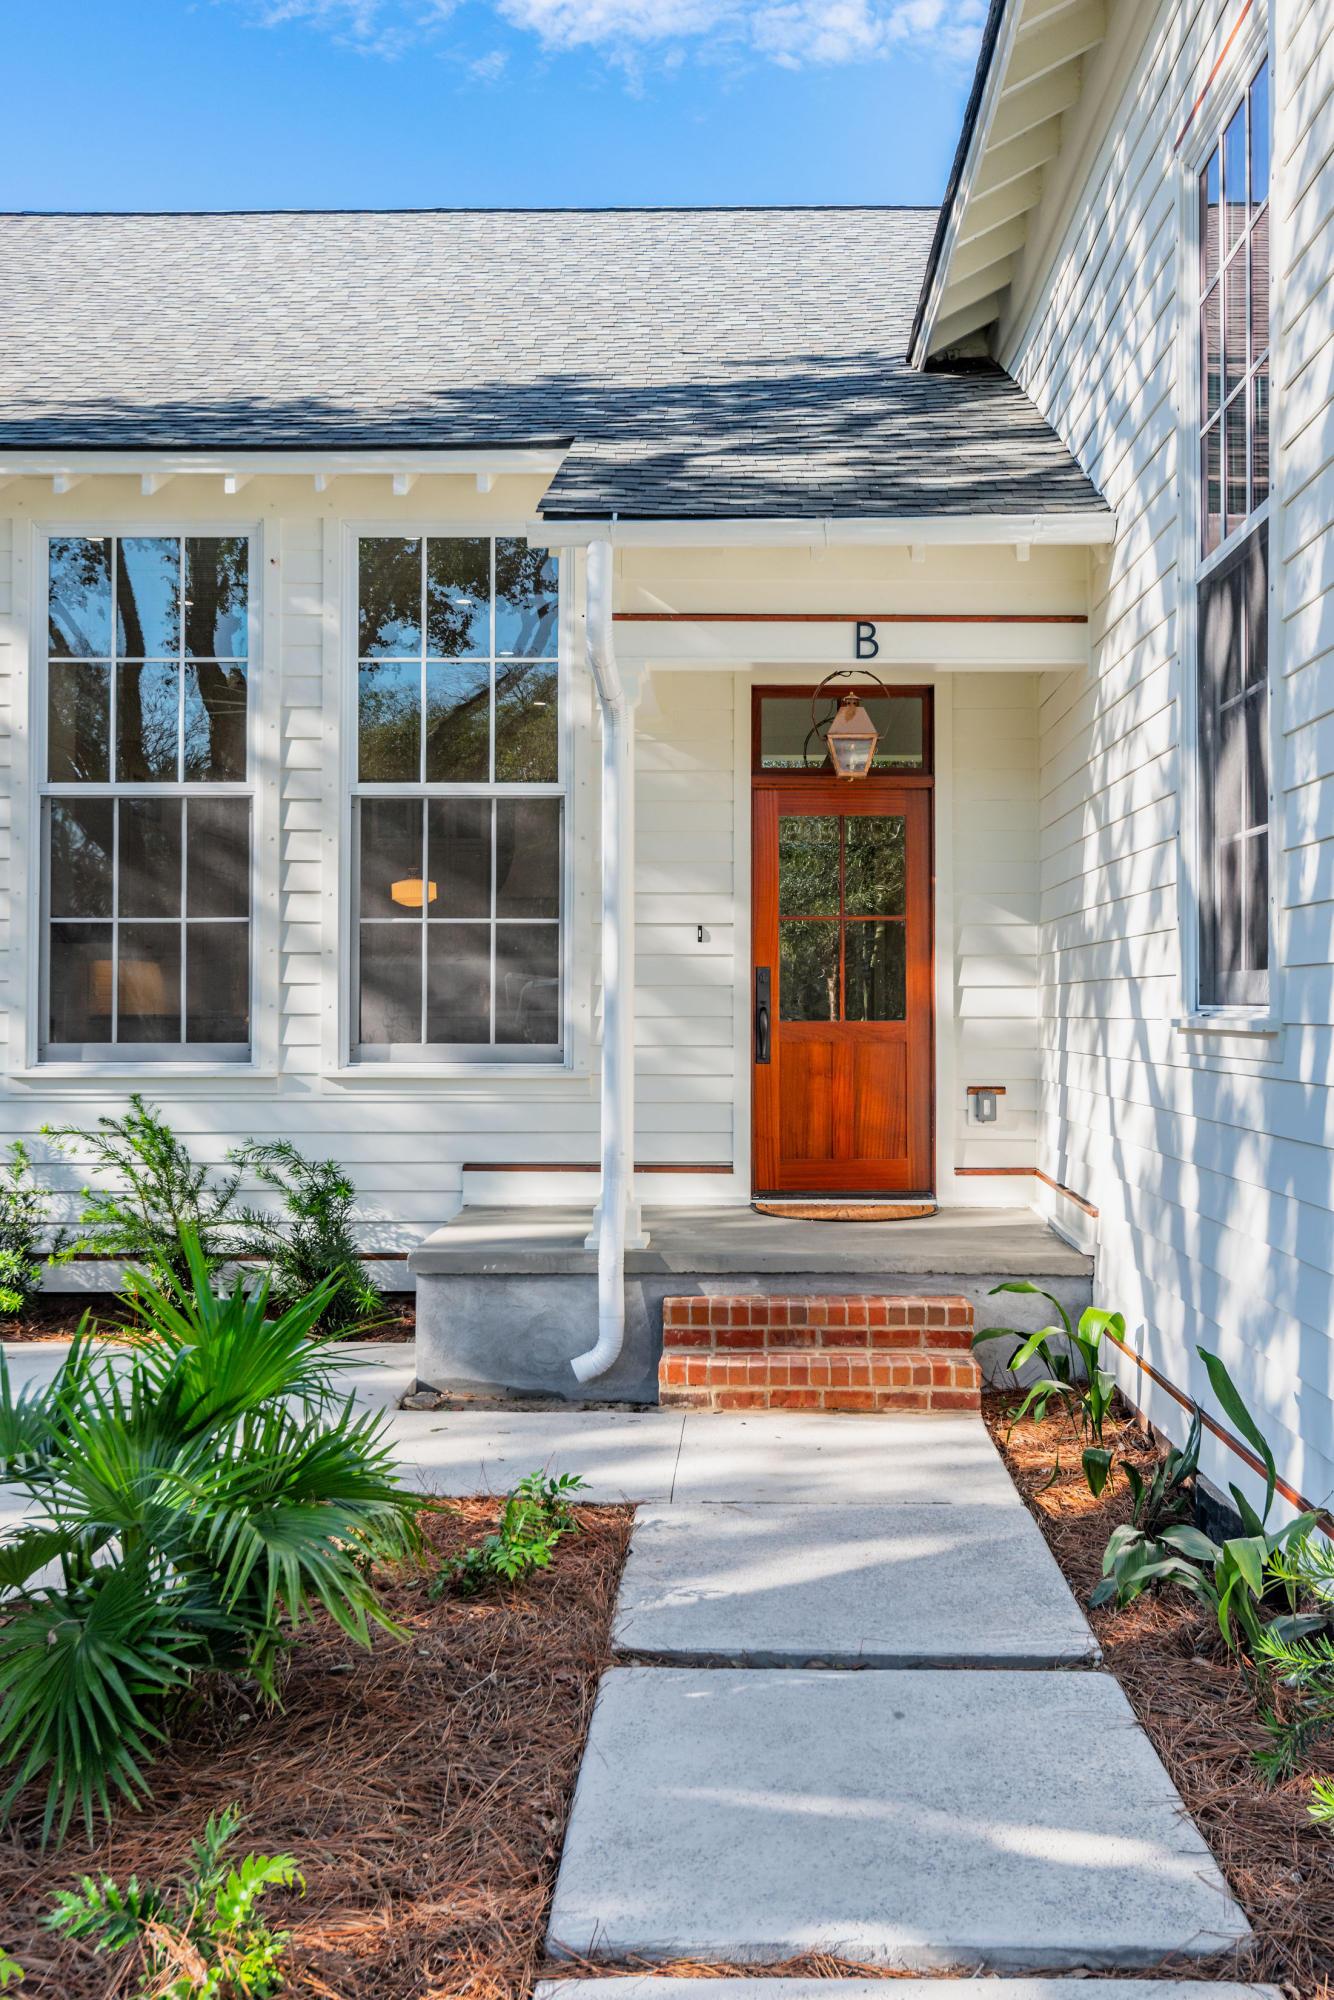 Sullivans House Homes For Sale - 2302 Middle, Sullivans Island, SC - 16